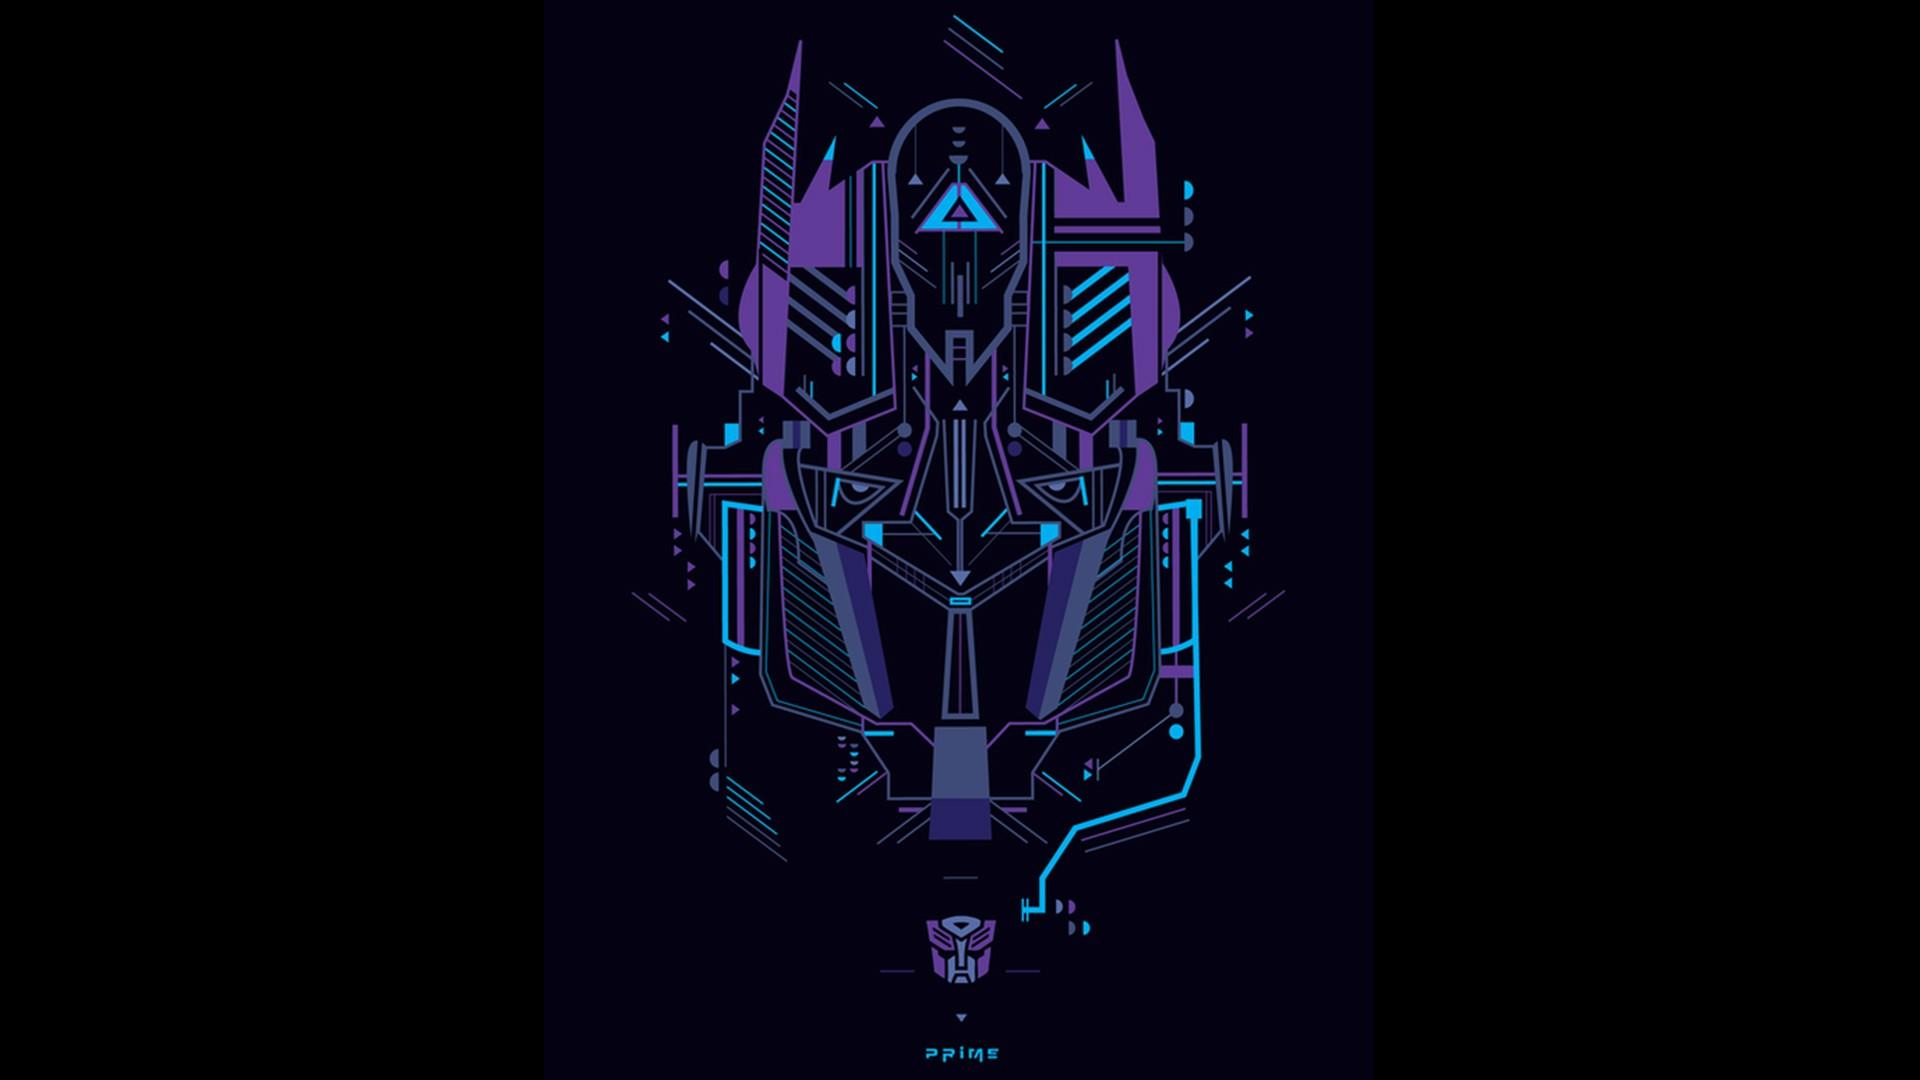 Sci Fi - Transformers Wallpaper